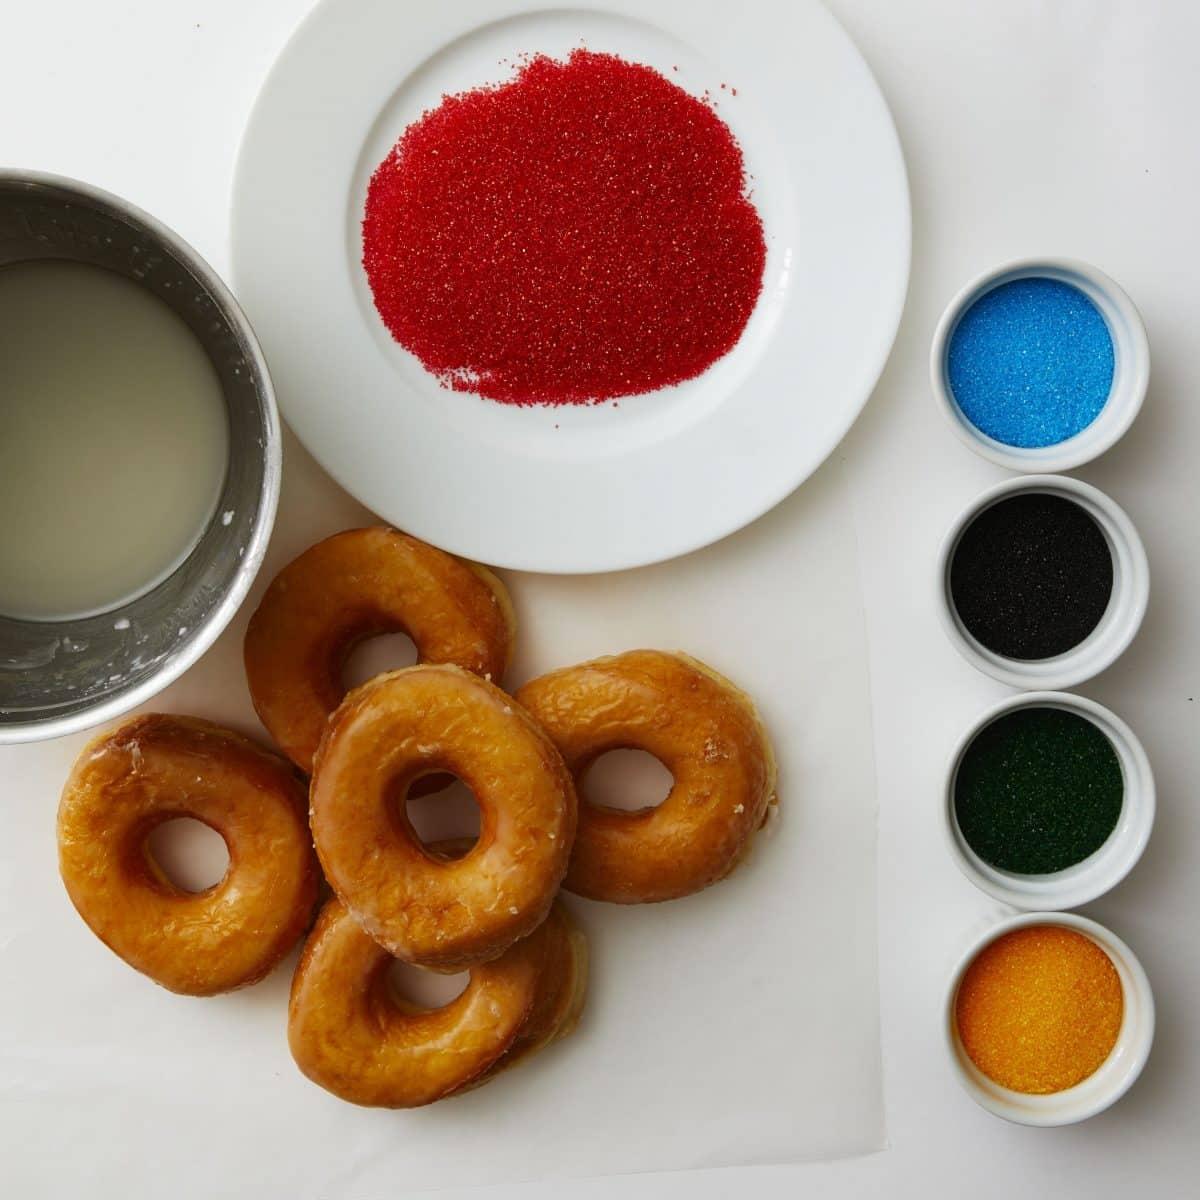 Darcy Miller Designs, Doughnut rings, Olympics, Olympics 2018, PyeongChang, doughnuts, sprinkles, sugar, Olympic rings, snack, breakfast, party, edible craft, Darcy Miller, DIY